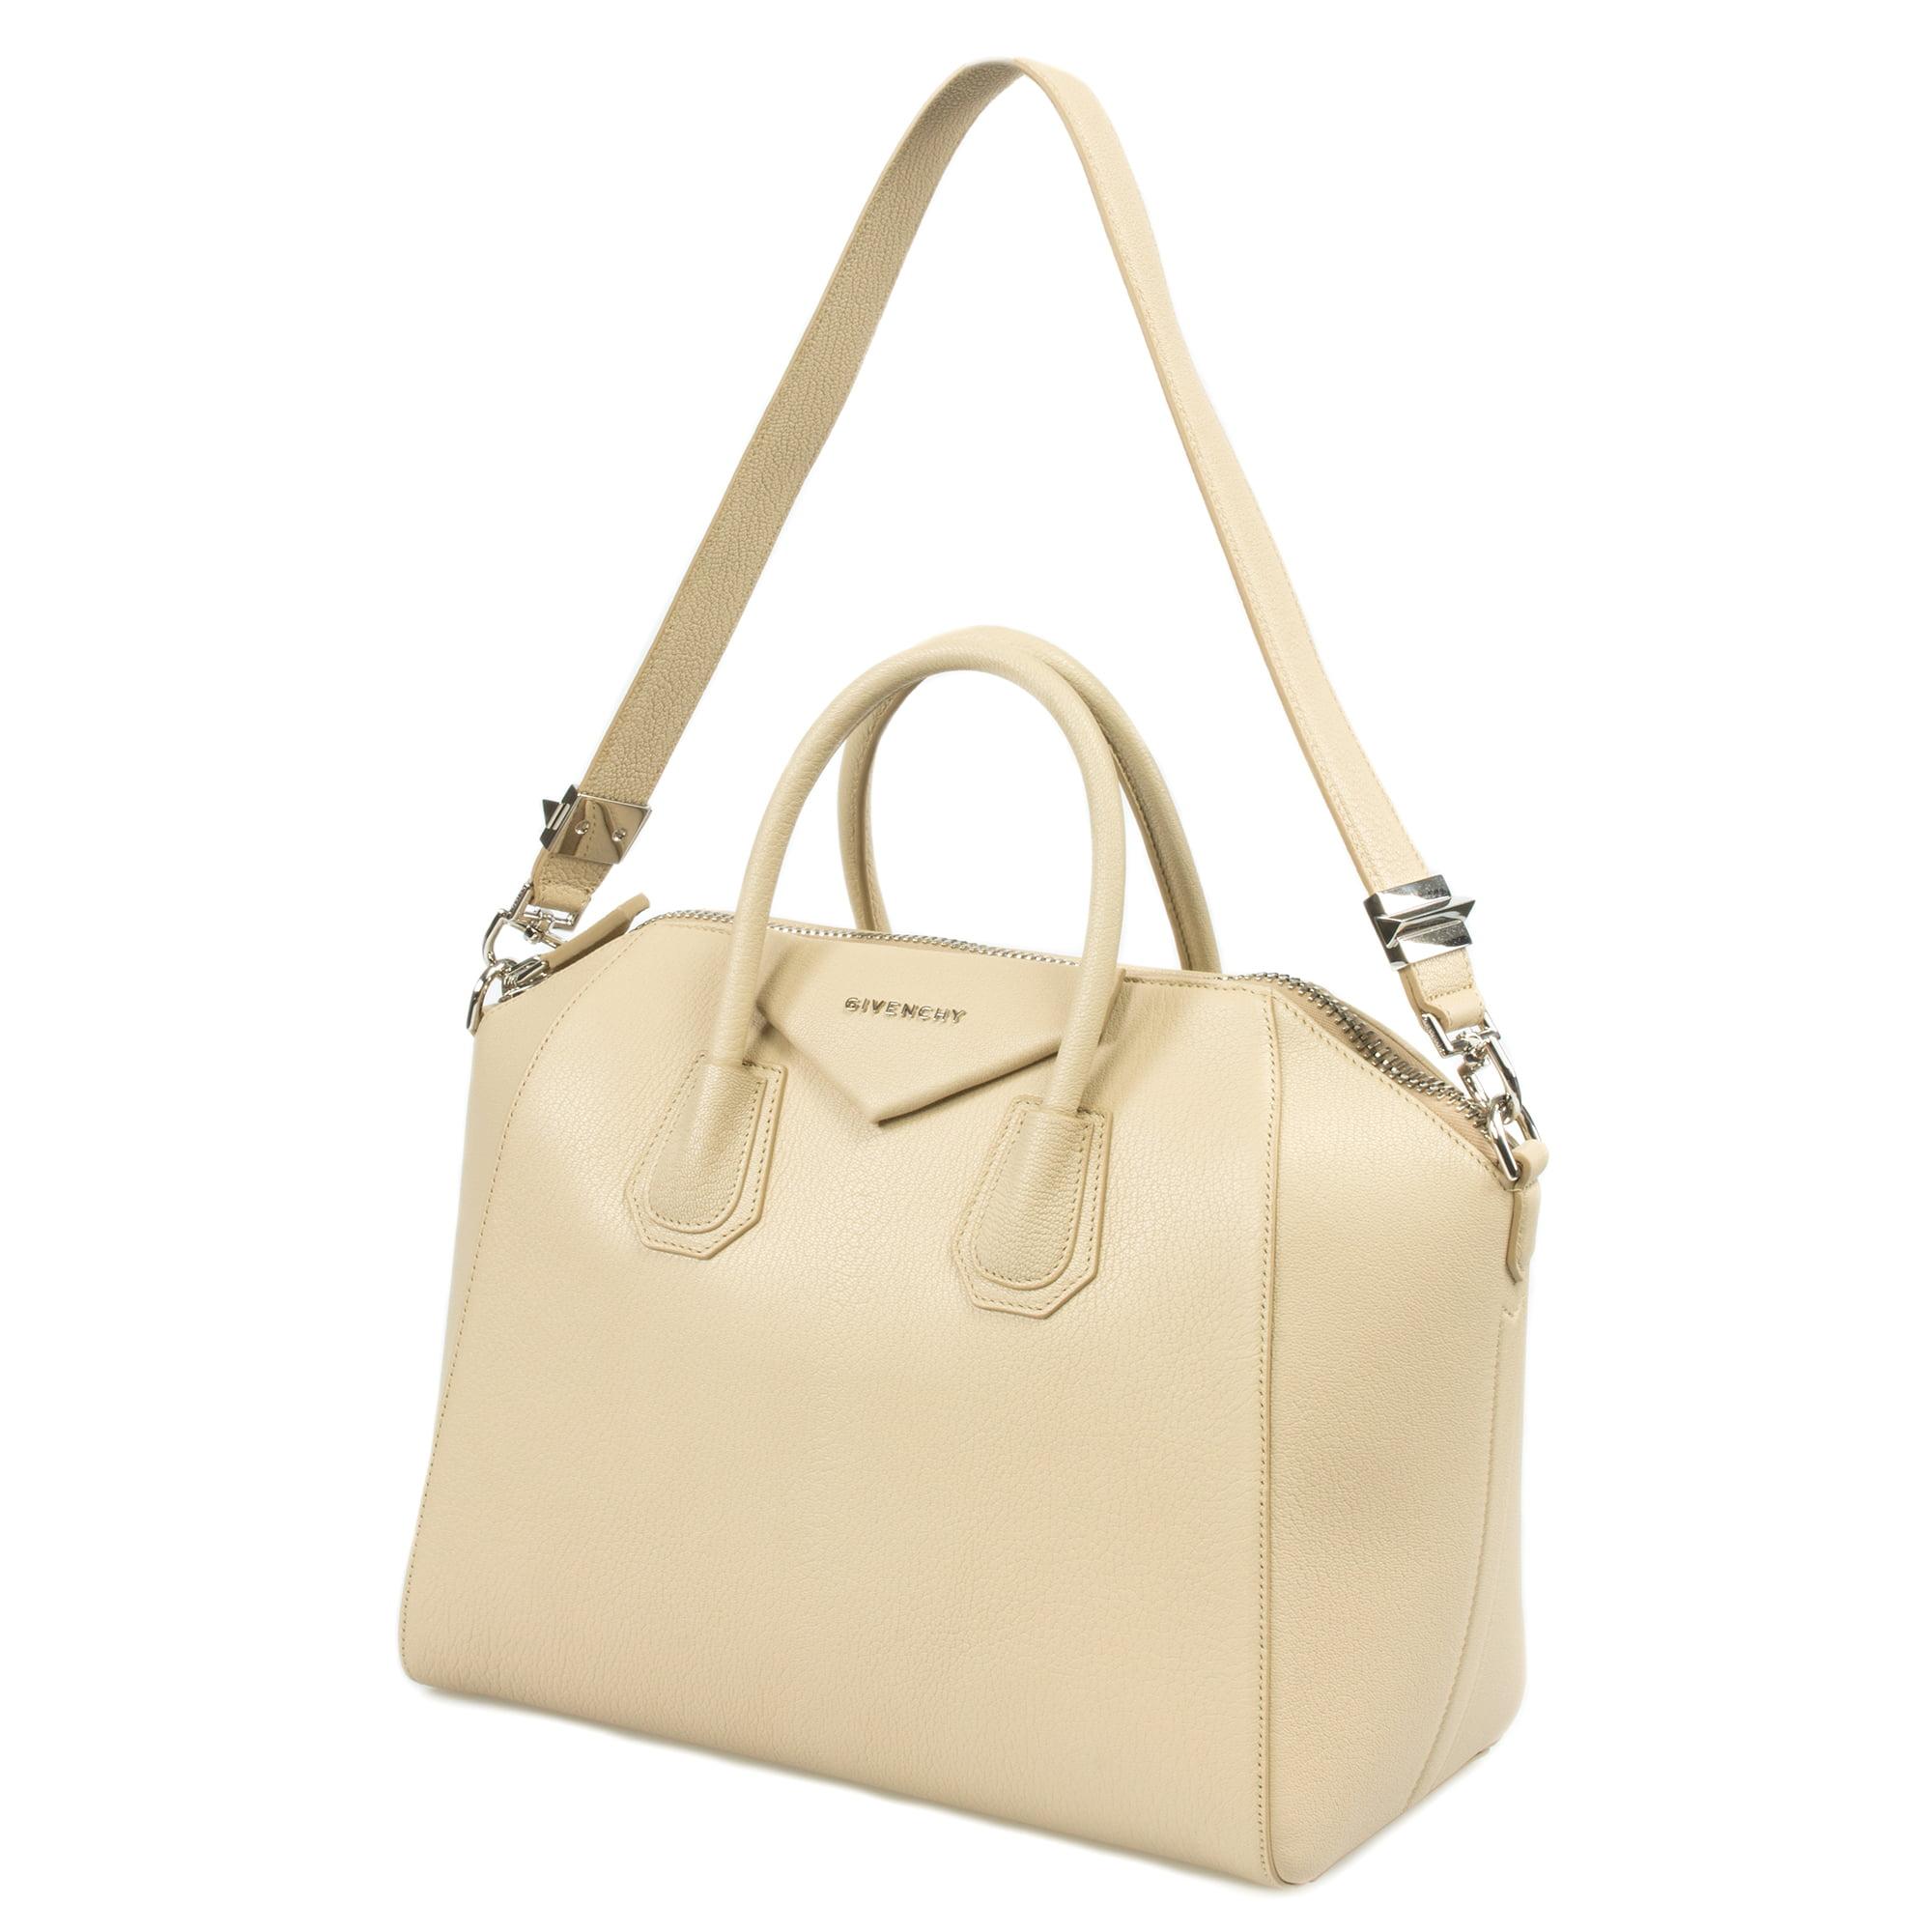 2b349cd8a1 ... Givenchy Antigona Sugar Goatskin Satchel Bag Beige w Silver Hardware  Medium - Walmart.com factory ...